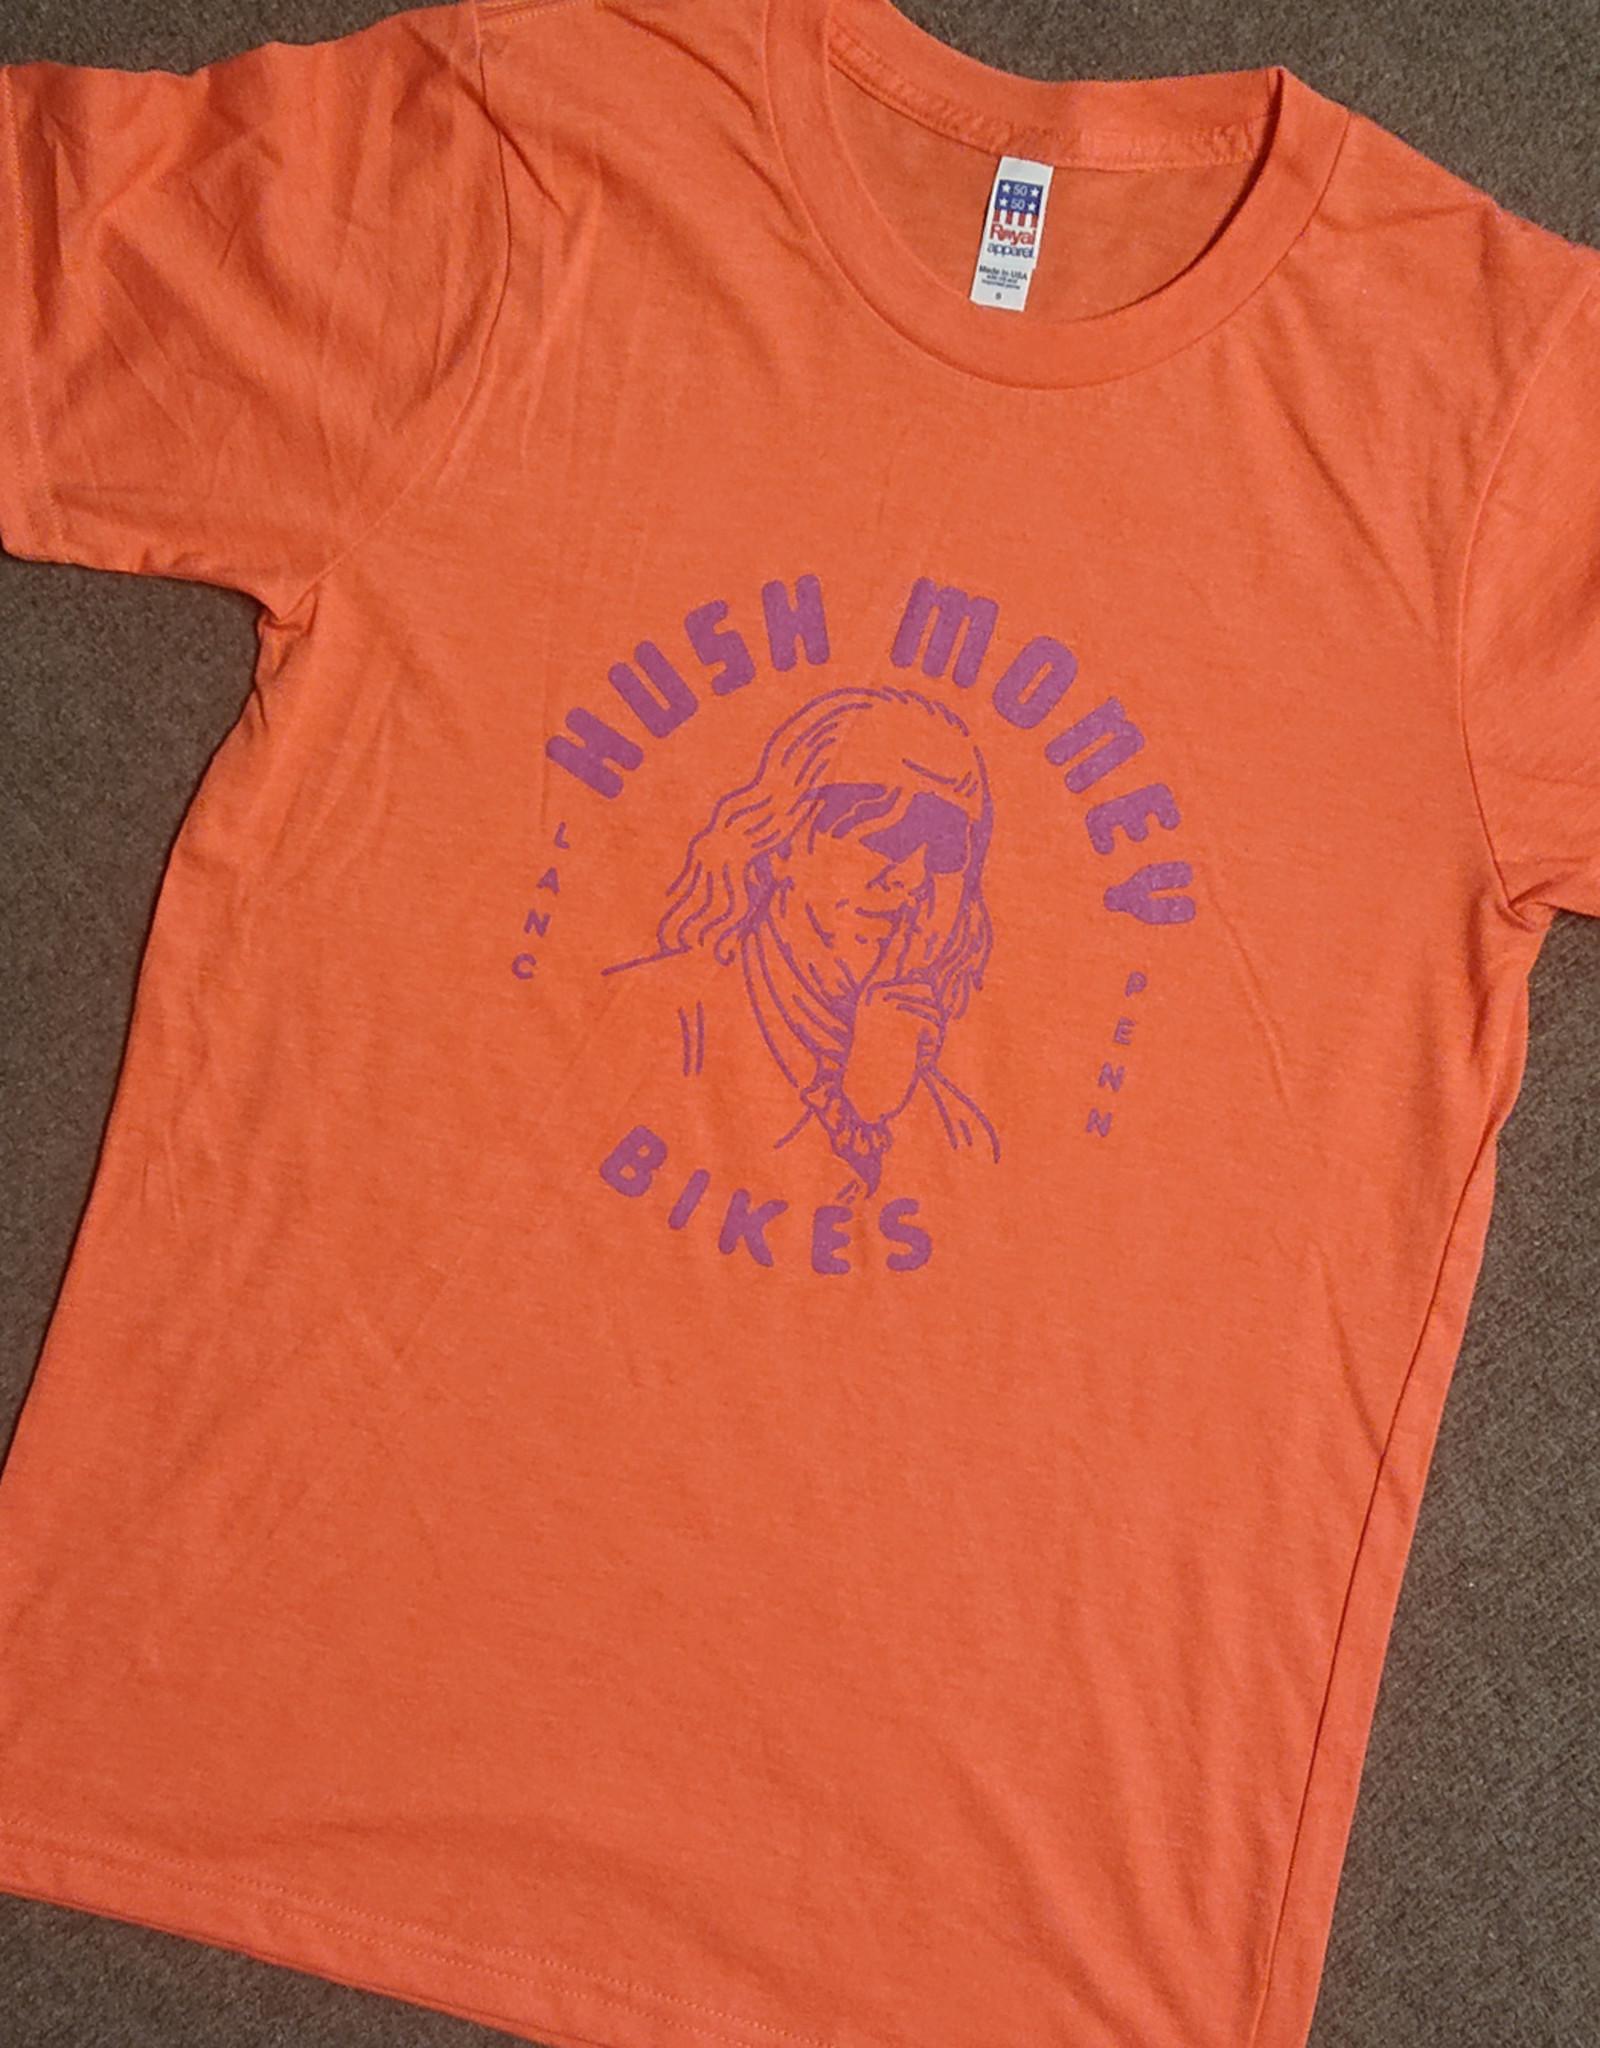 Ben Cranklin T-Shirt Orange You Glad